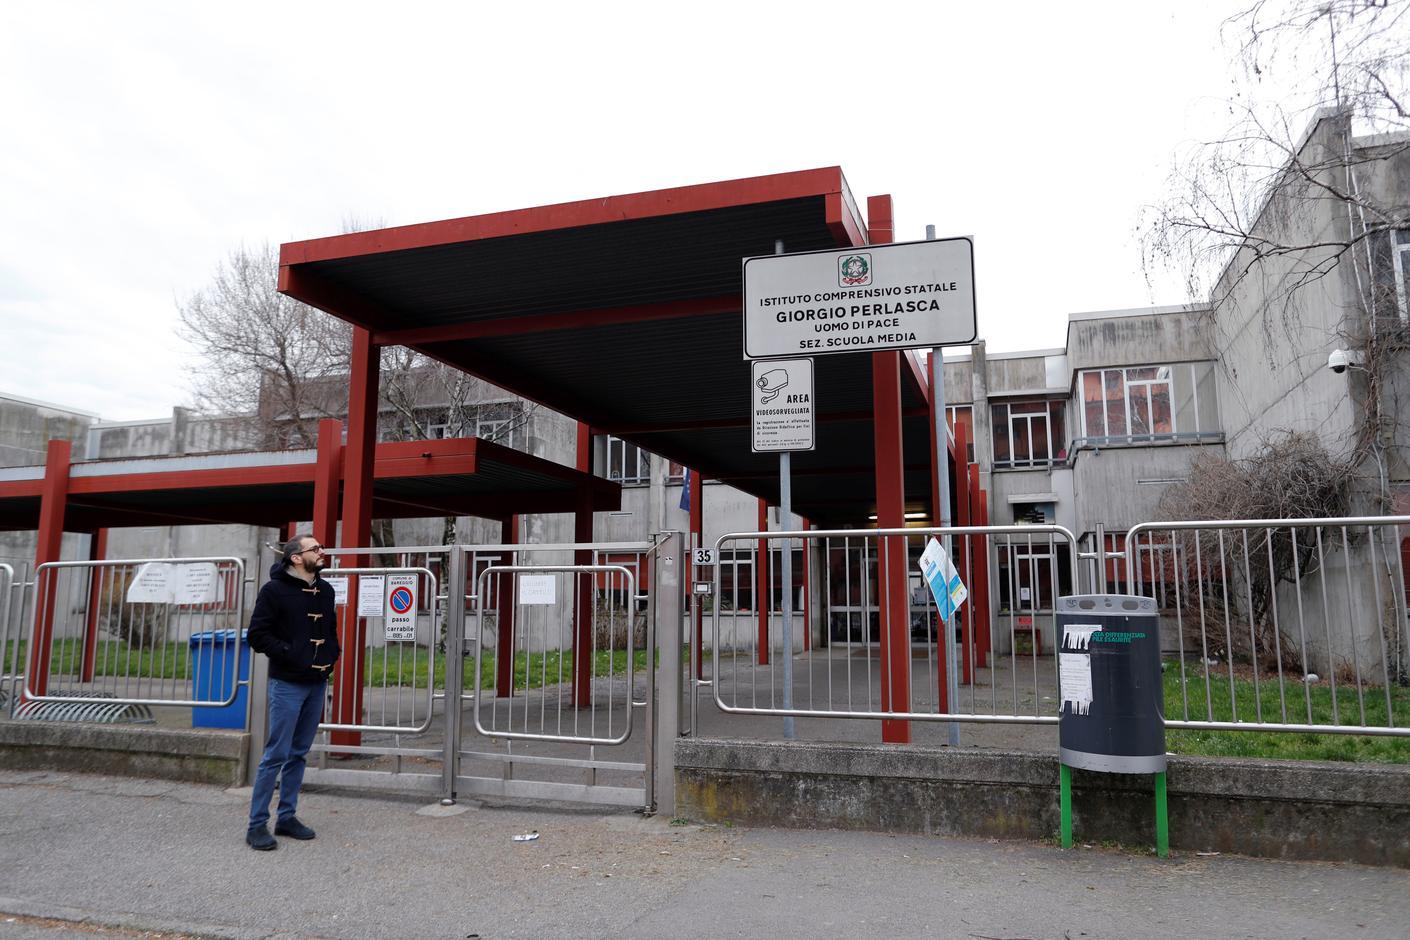 Schools, universities to stay shut as Italy coronavirus death toll rises